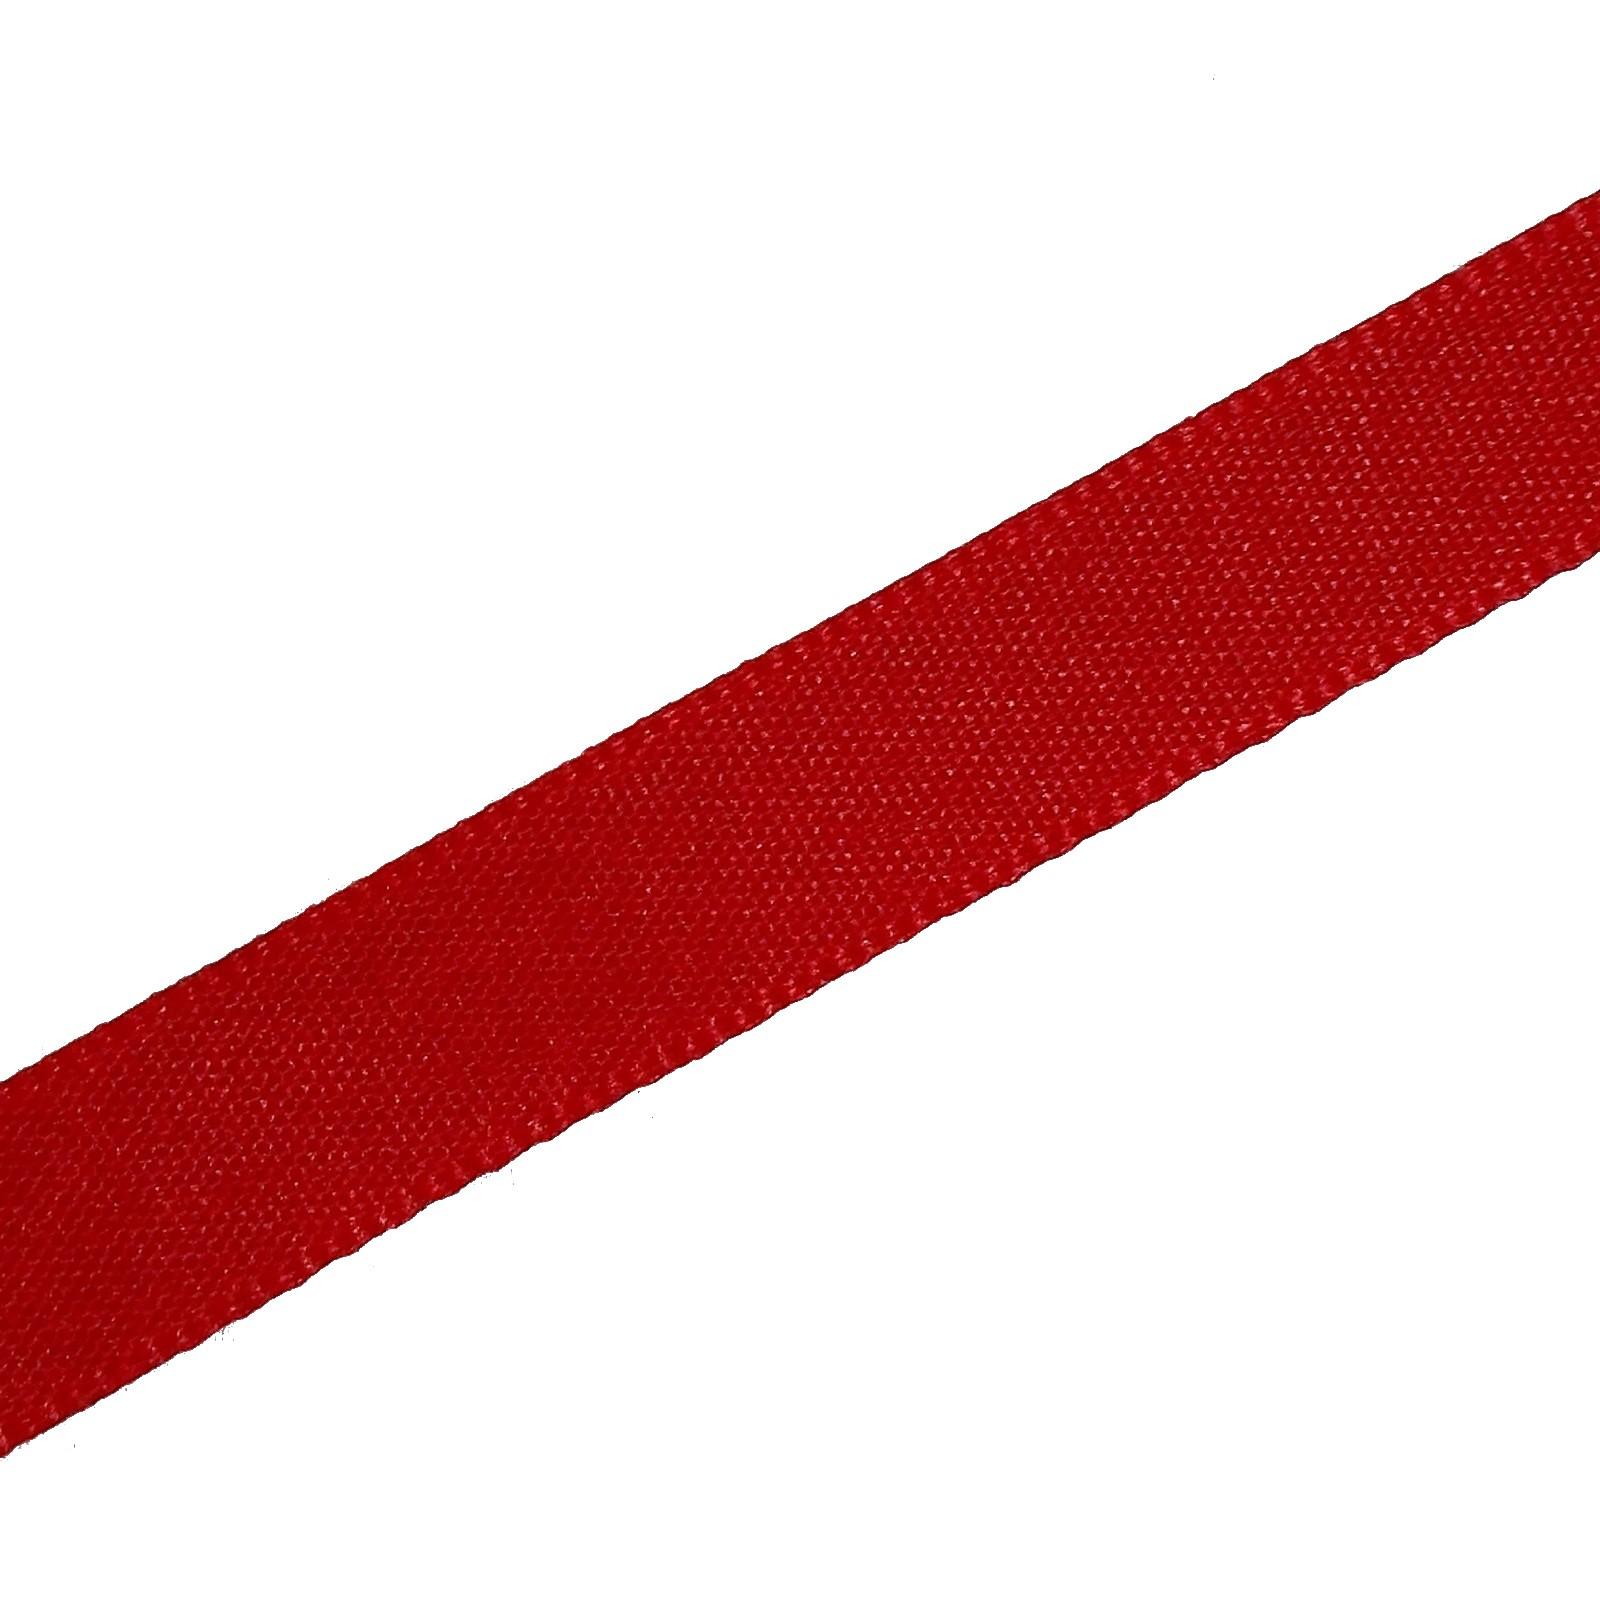 Berisfords Seam Binding Polyester Ribbon Tape 12mm wide Red 3 metre length